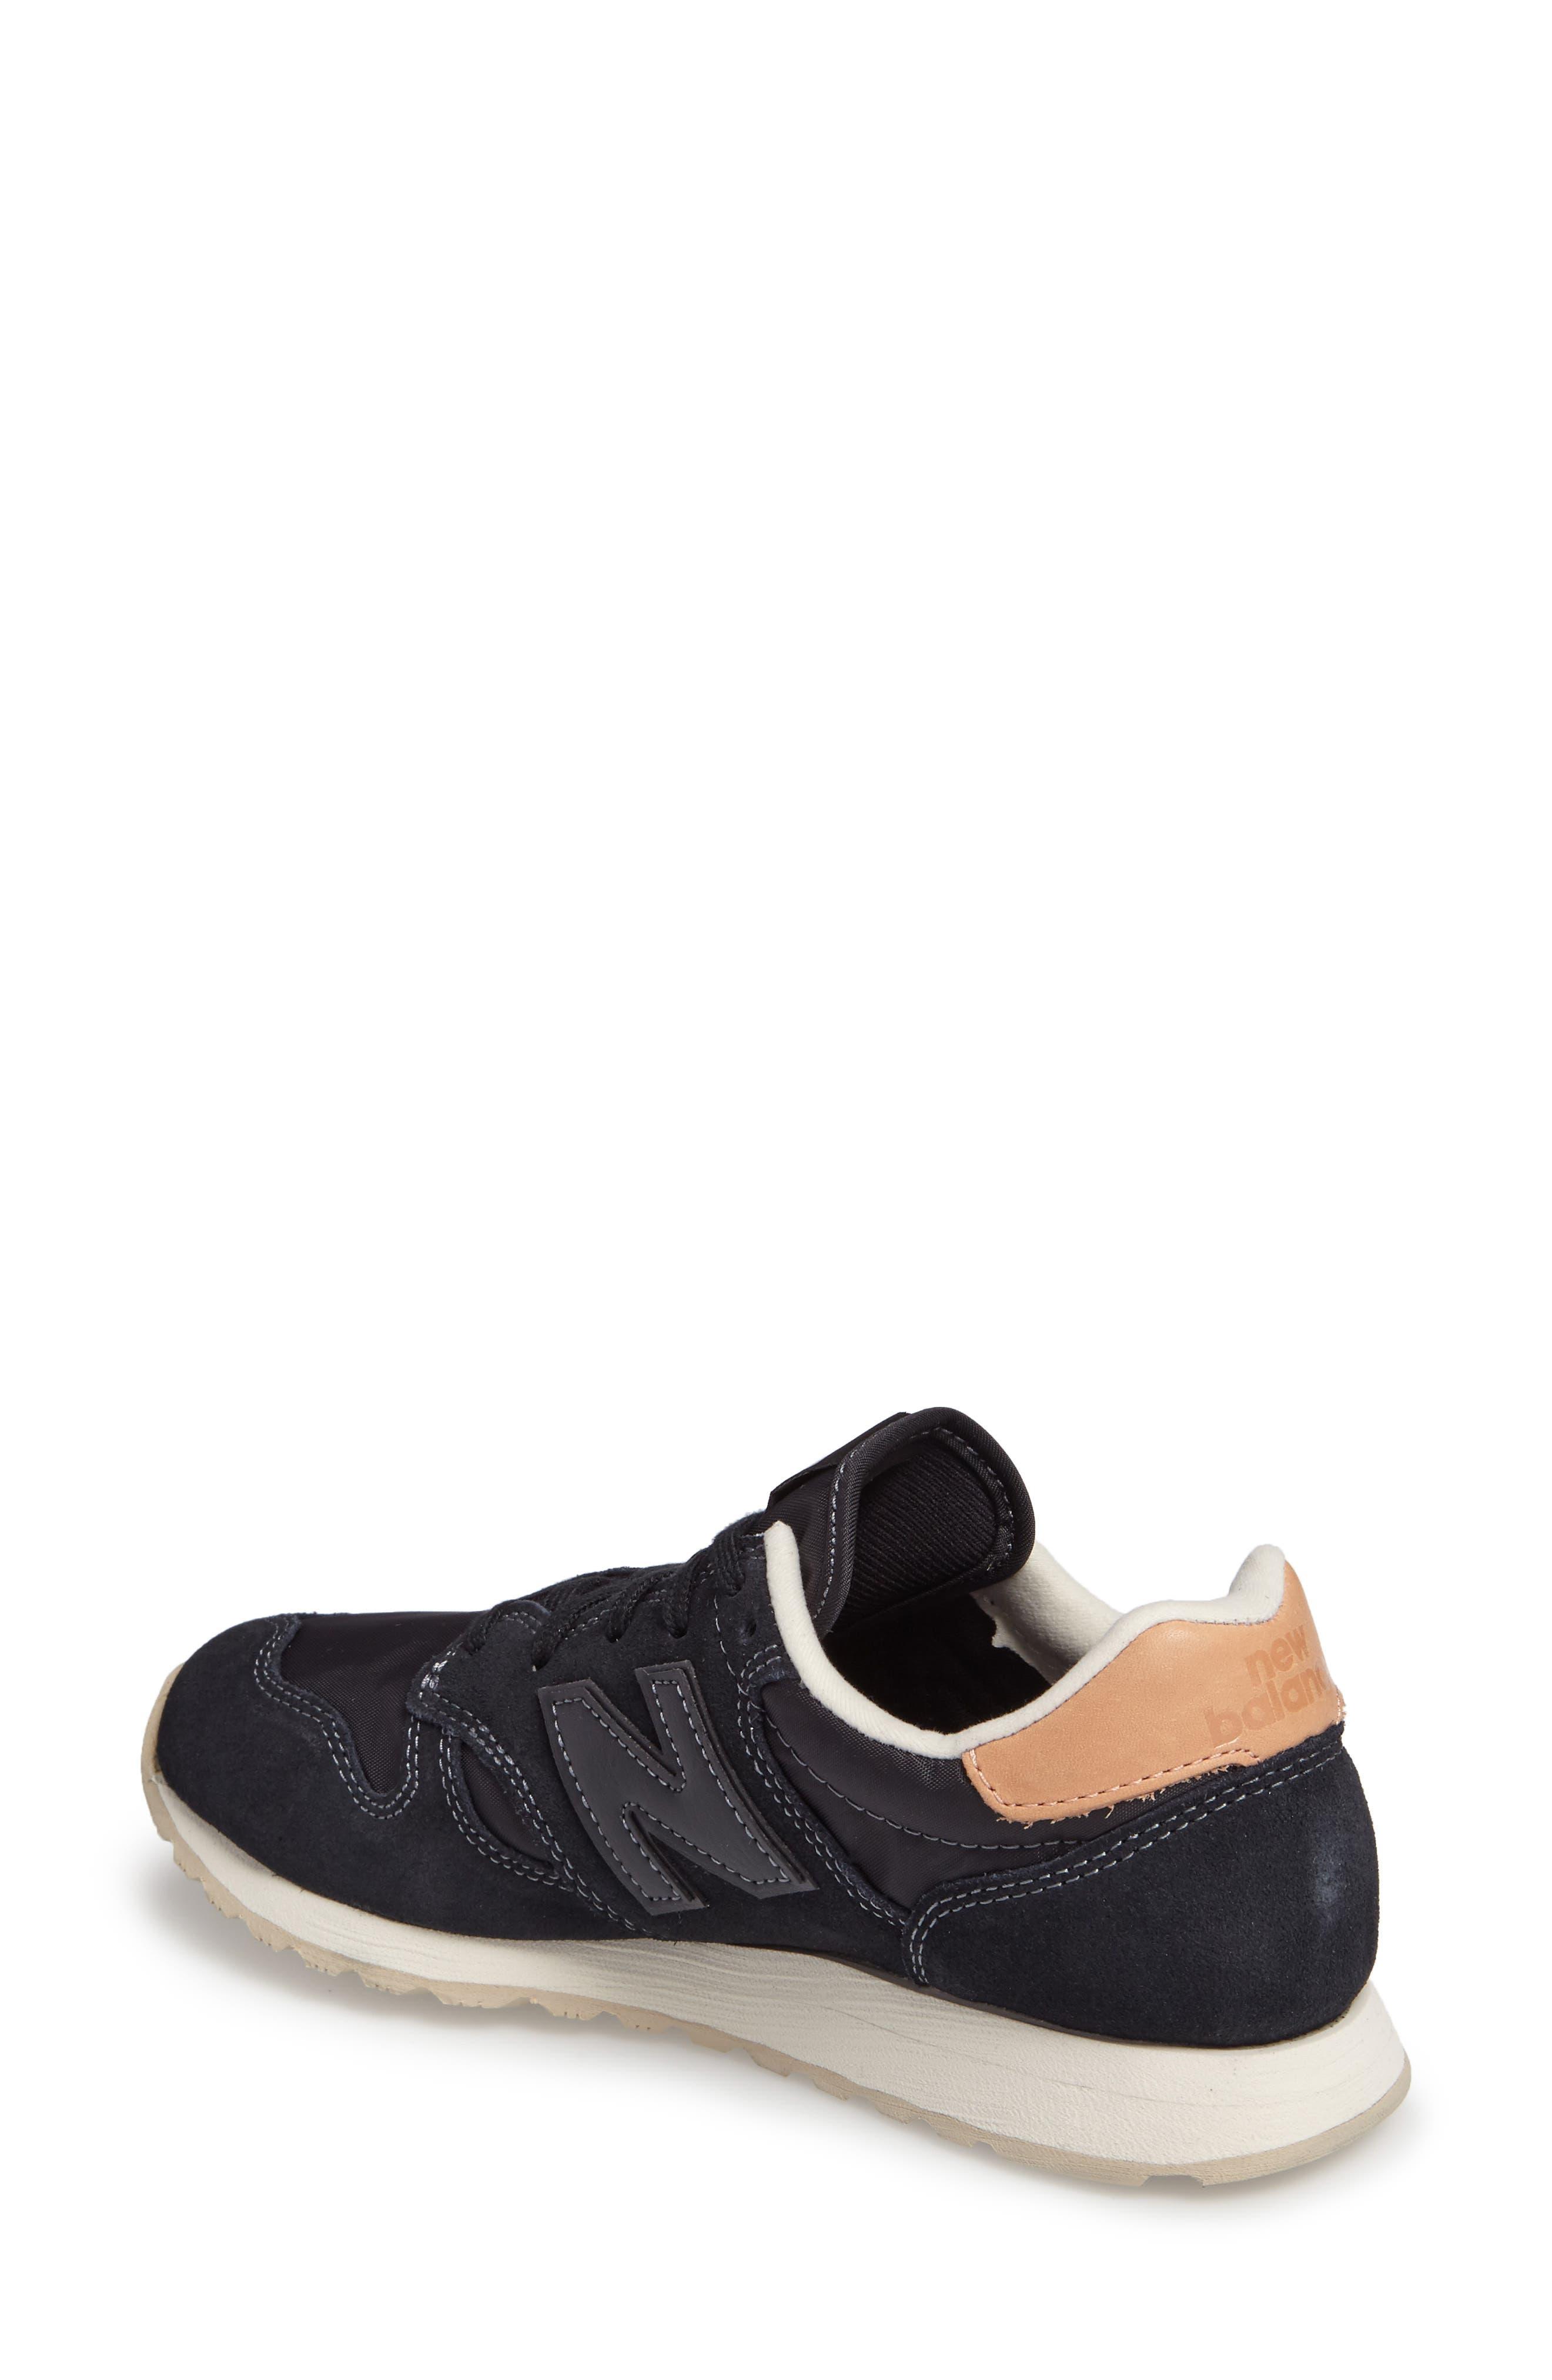 Alternate Image 2  - New Balance 520 Sneaker (Women)